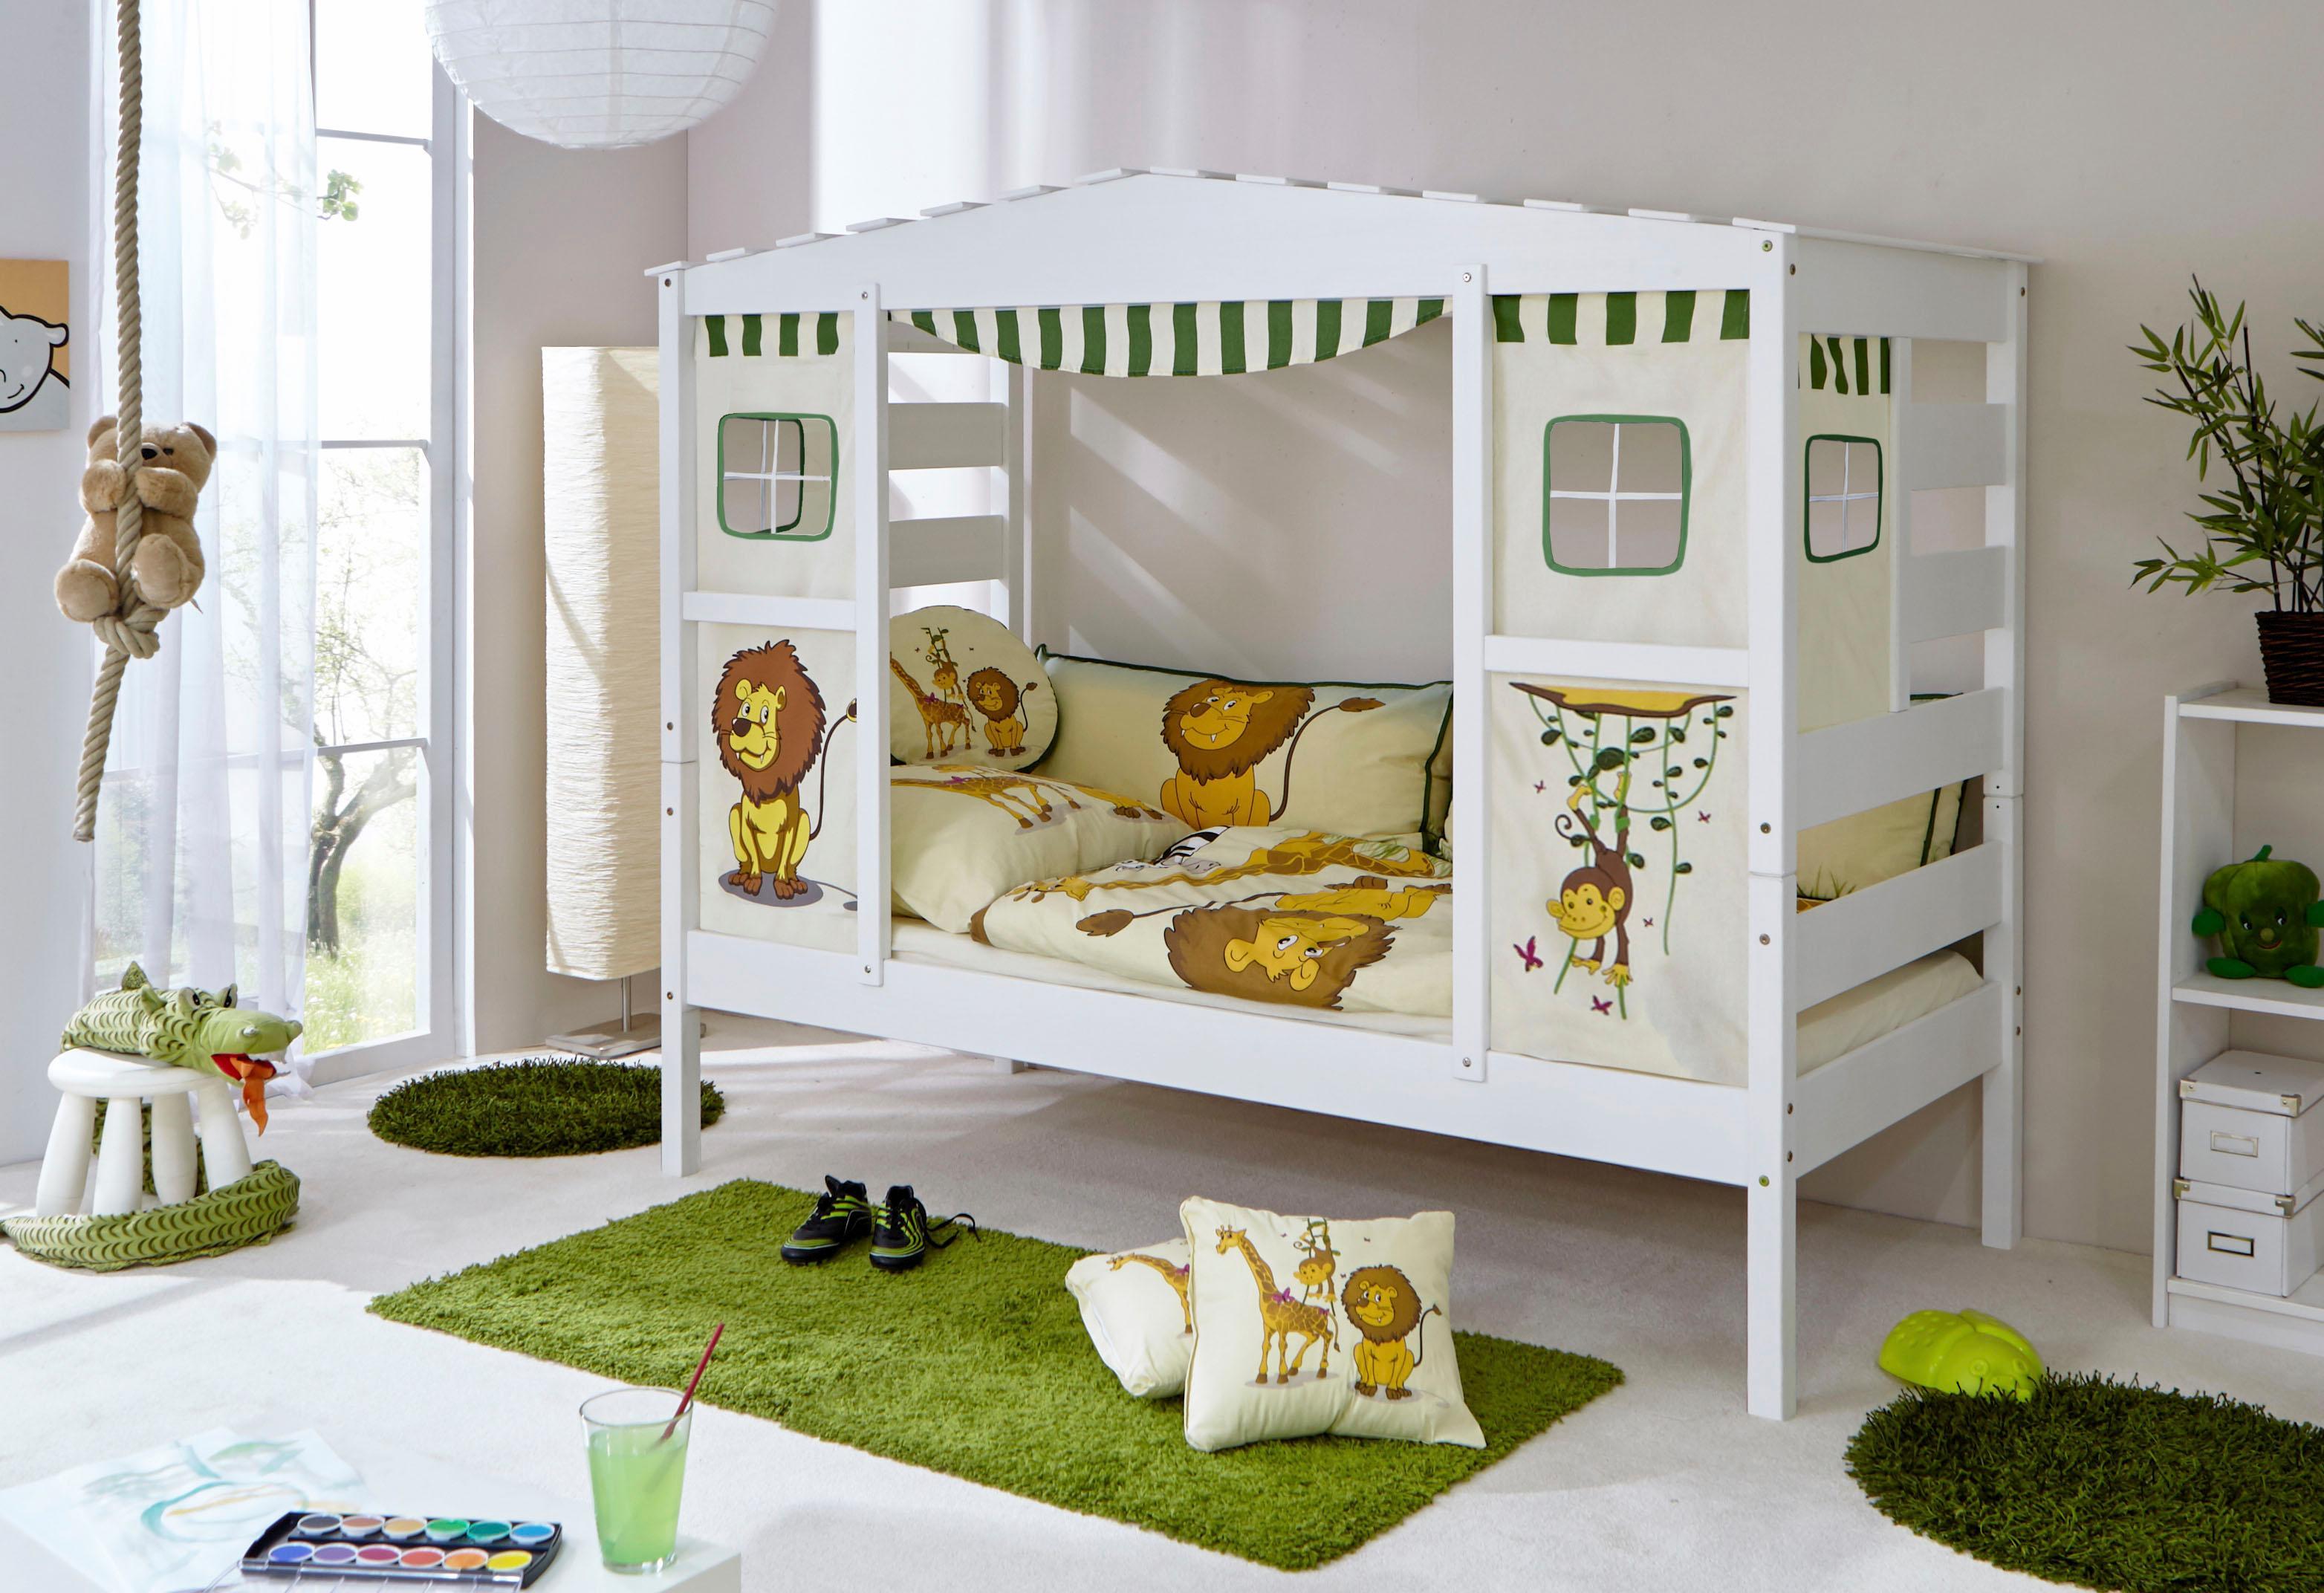 Ticaa Hausbett Lio weiß Kinder Kinderbetten Kindermöbel